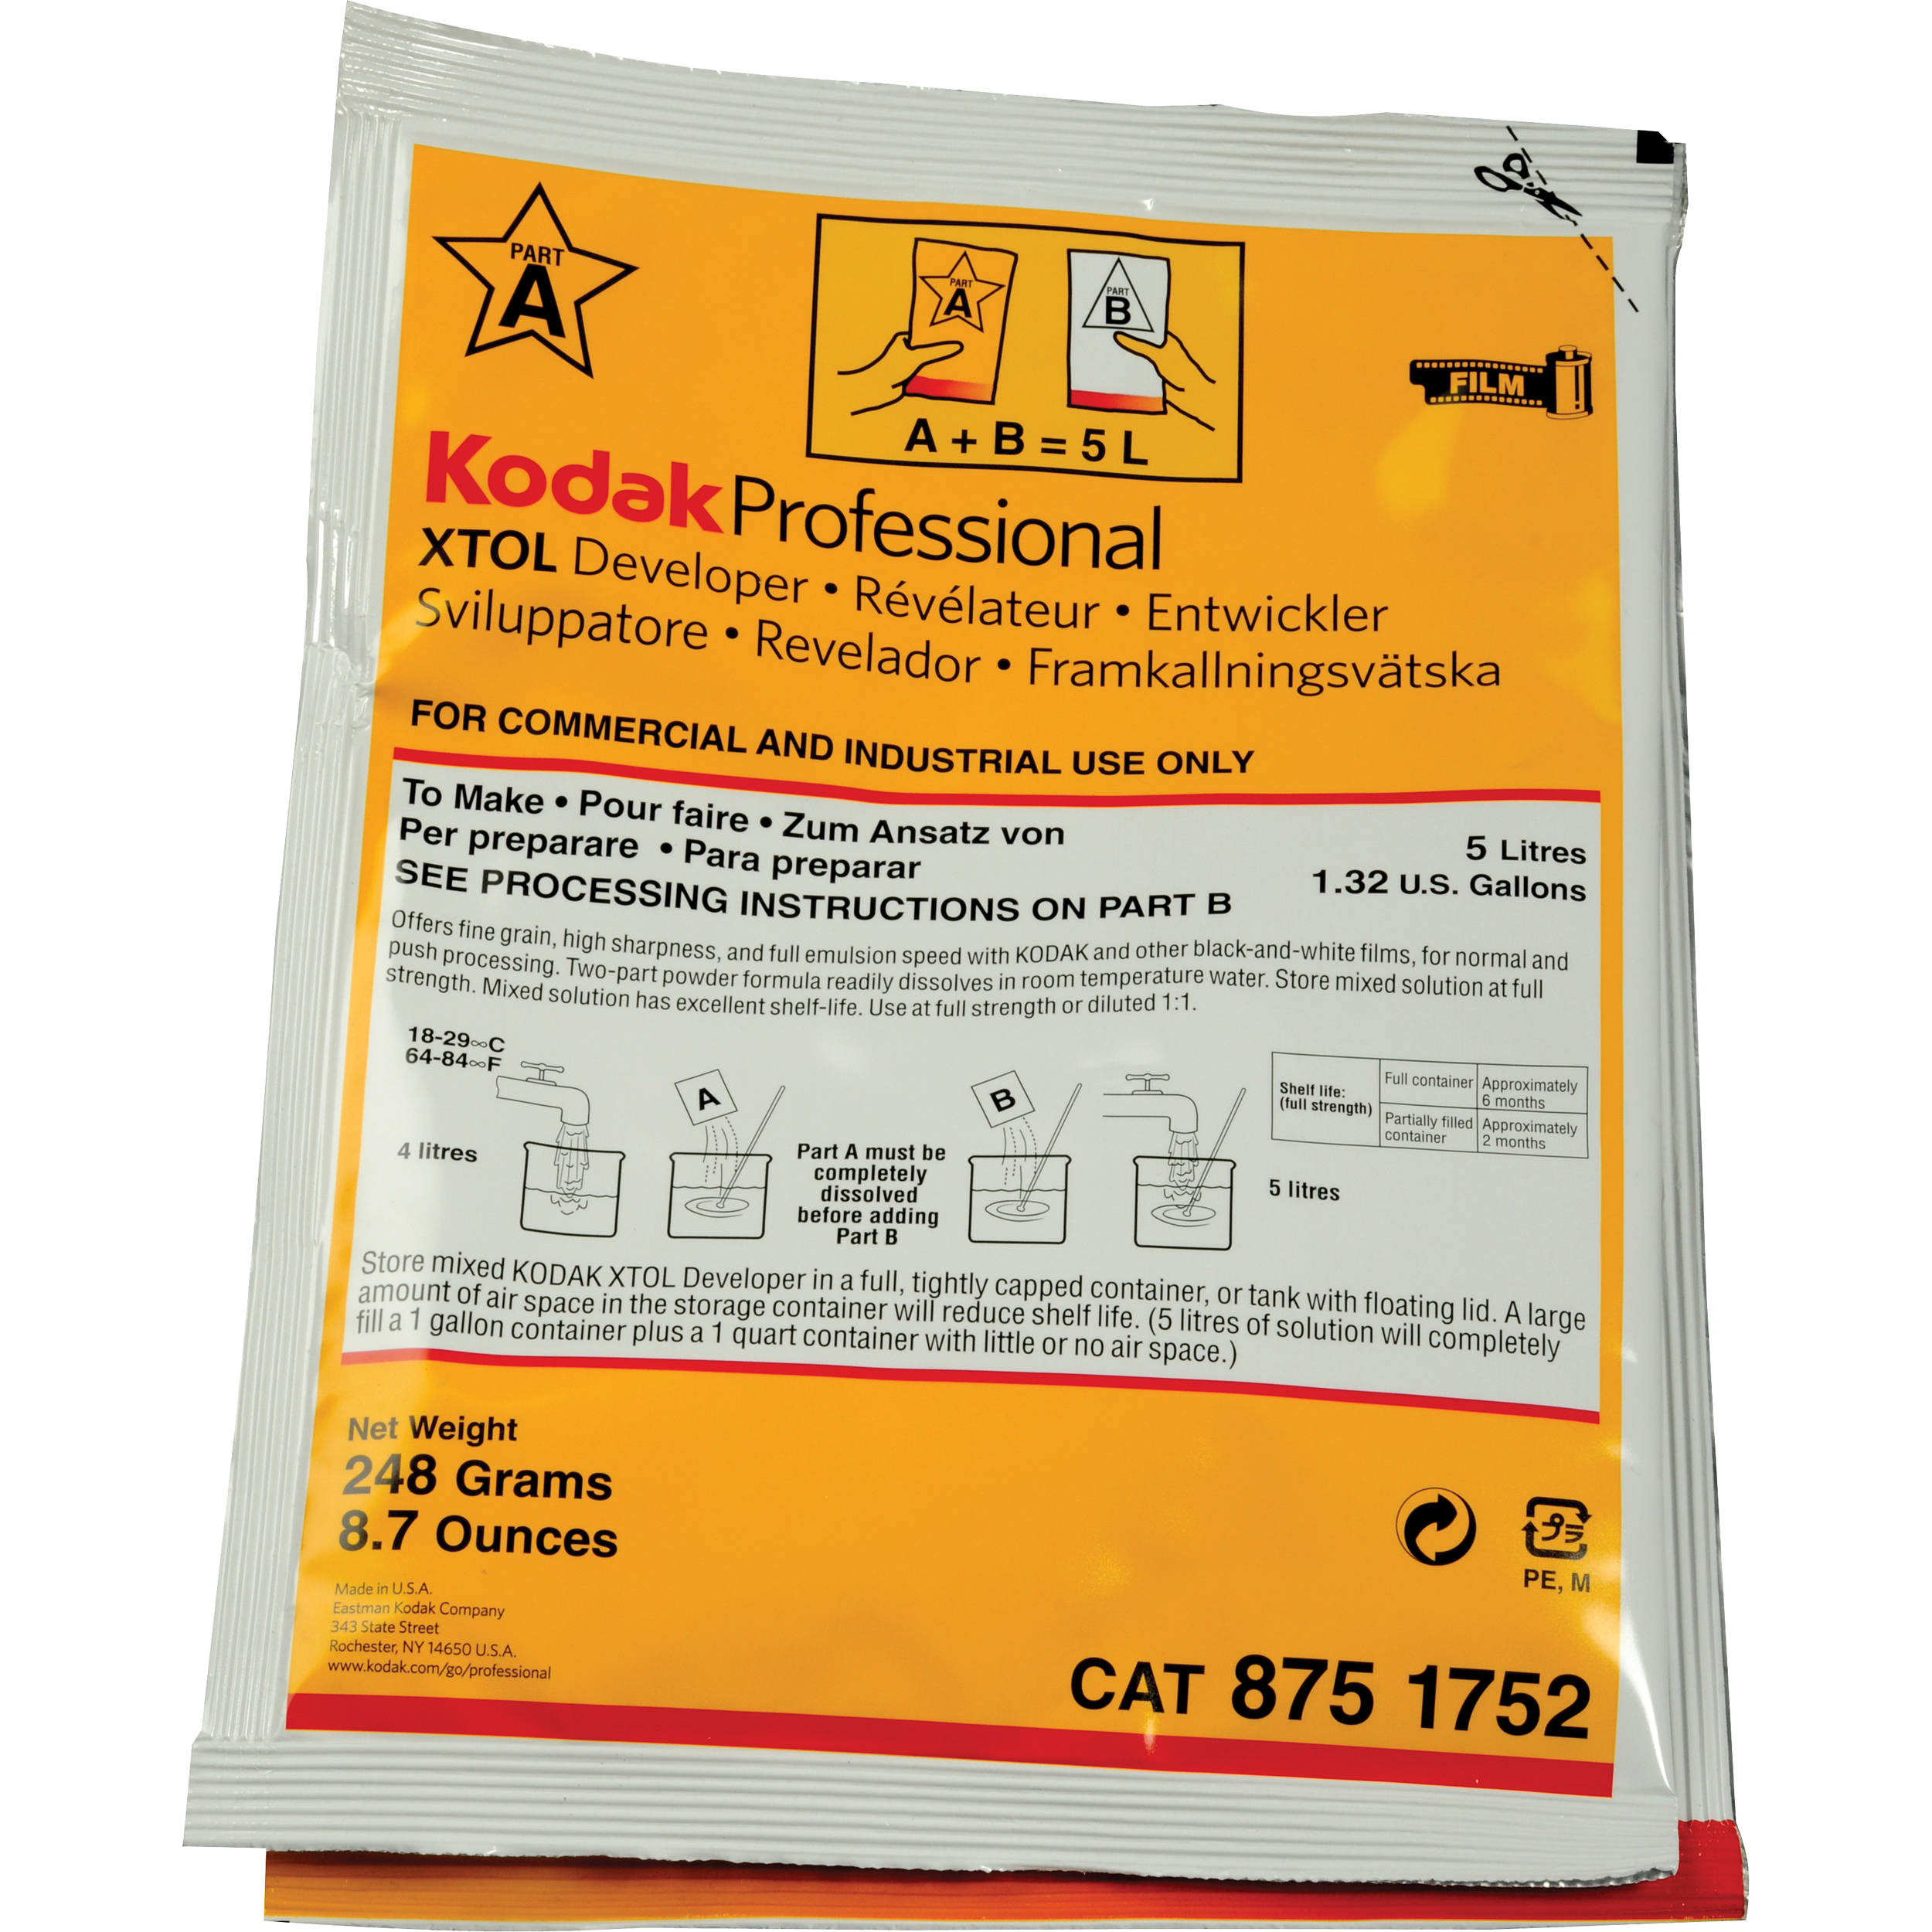 Kodak Professional Xtol Black And White Film Developer 5160361 Pot 2 Temps Pro Circuit Works Pieces Moto Cross Diffusion To Make 5 L